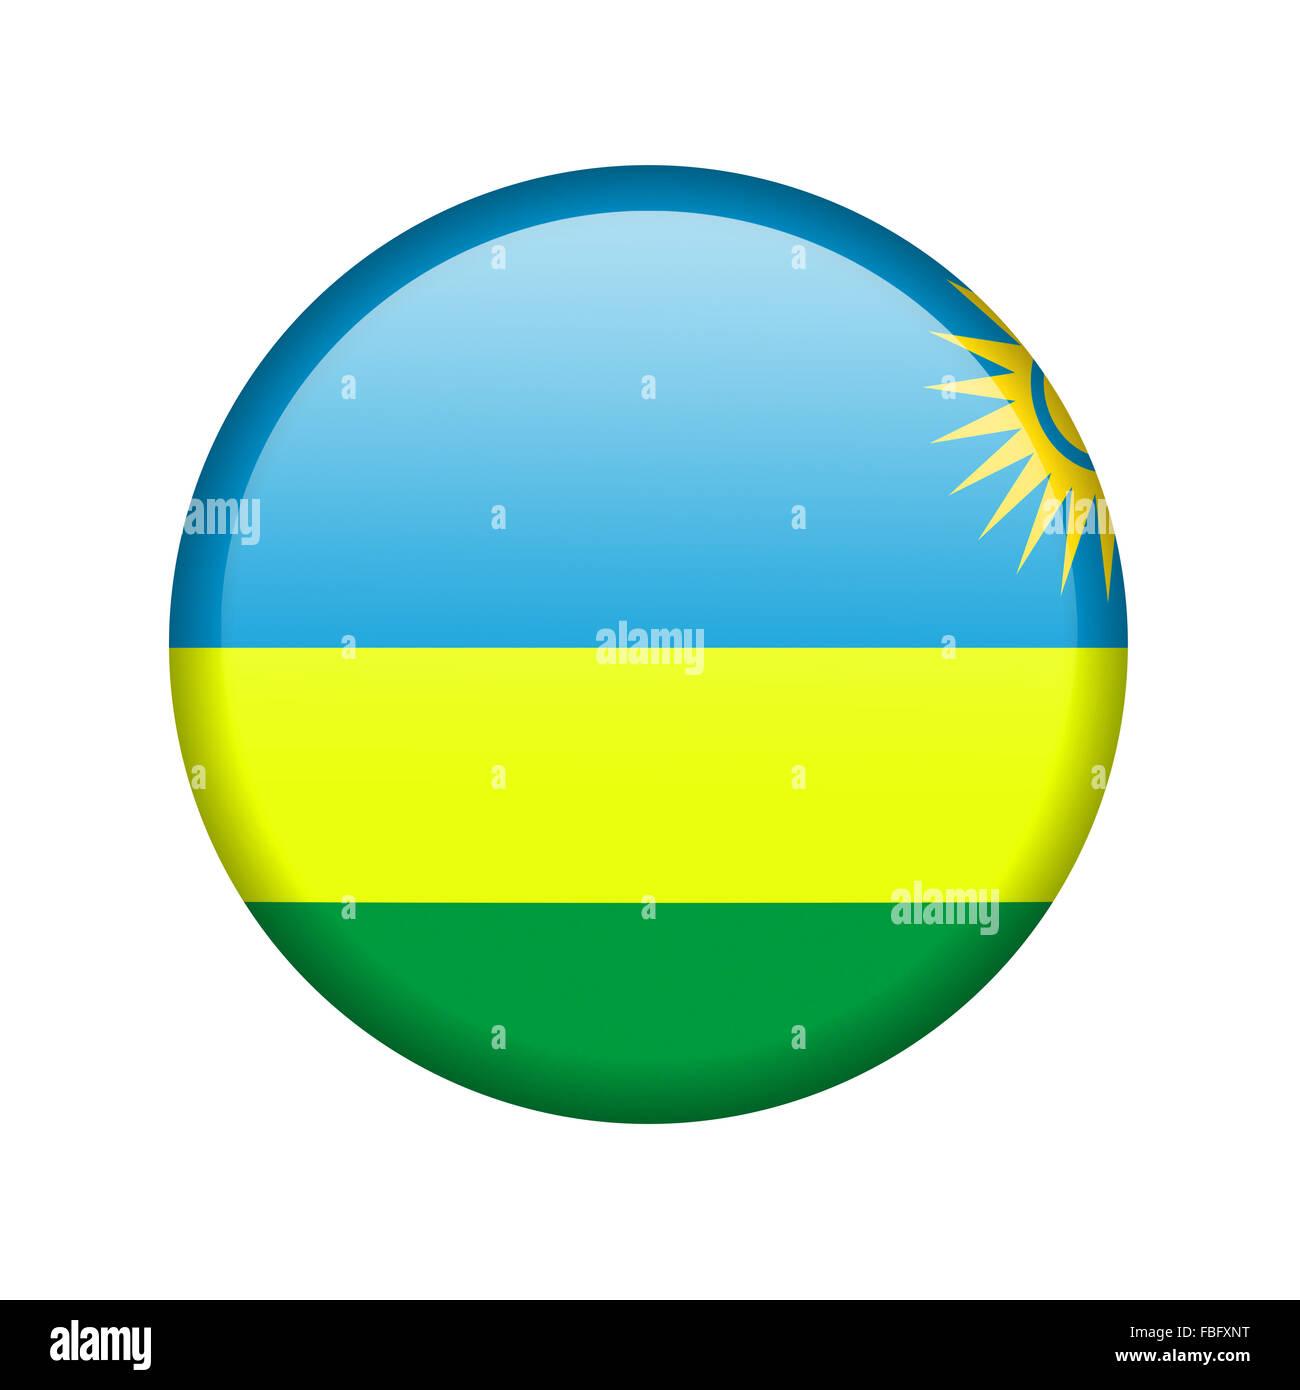 The Rwanda Flag Stock Photo Royalty Free Image Alamy - Rwanda flag